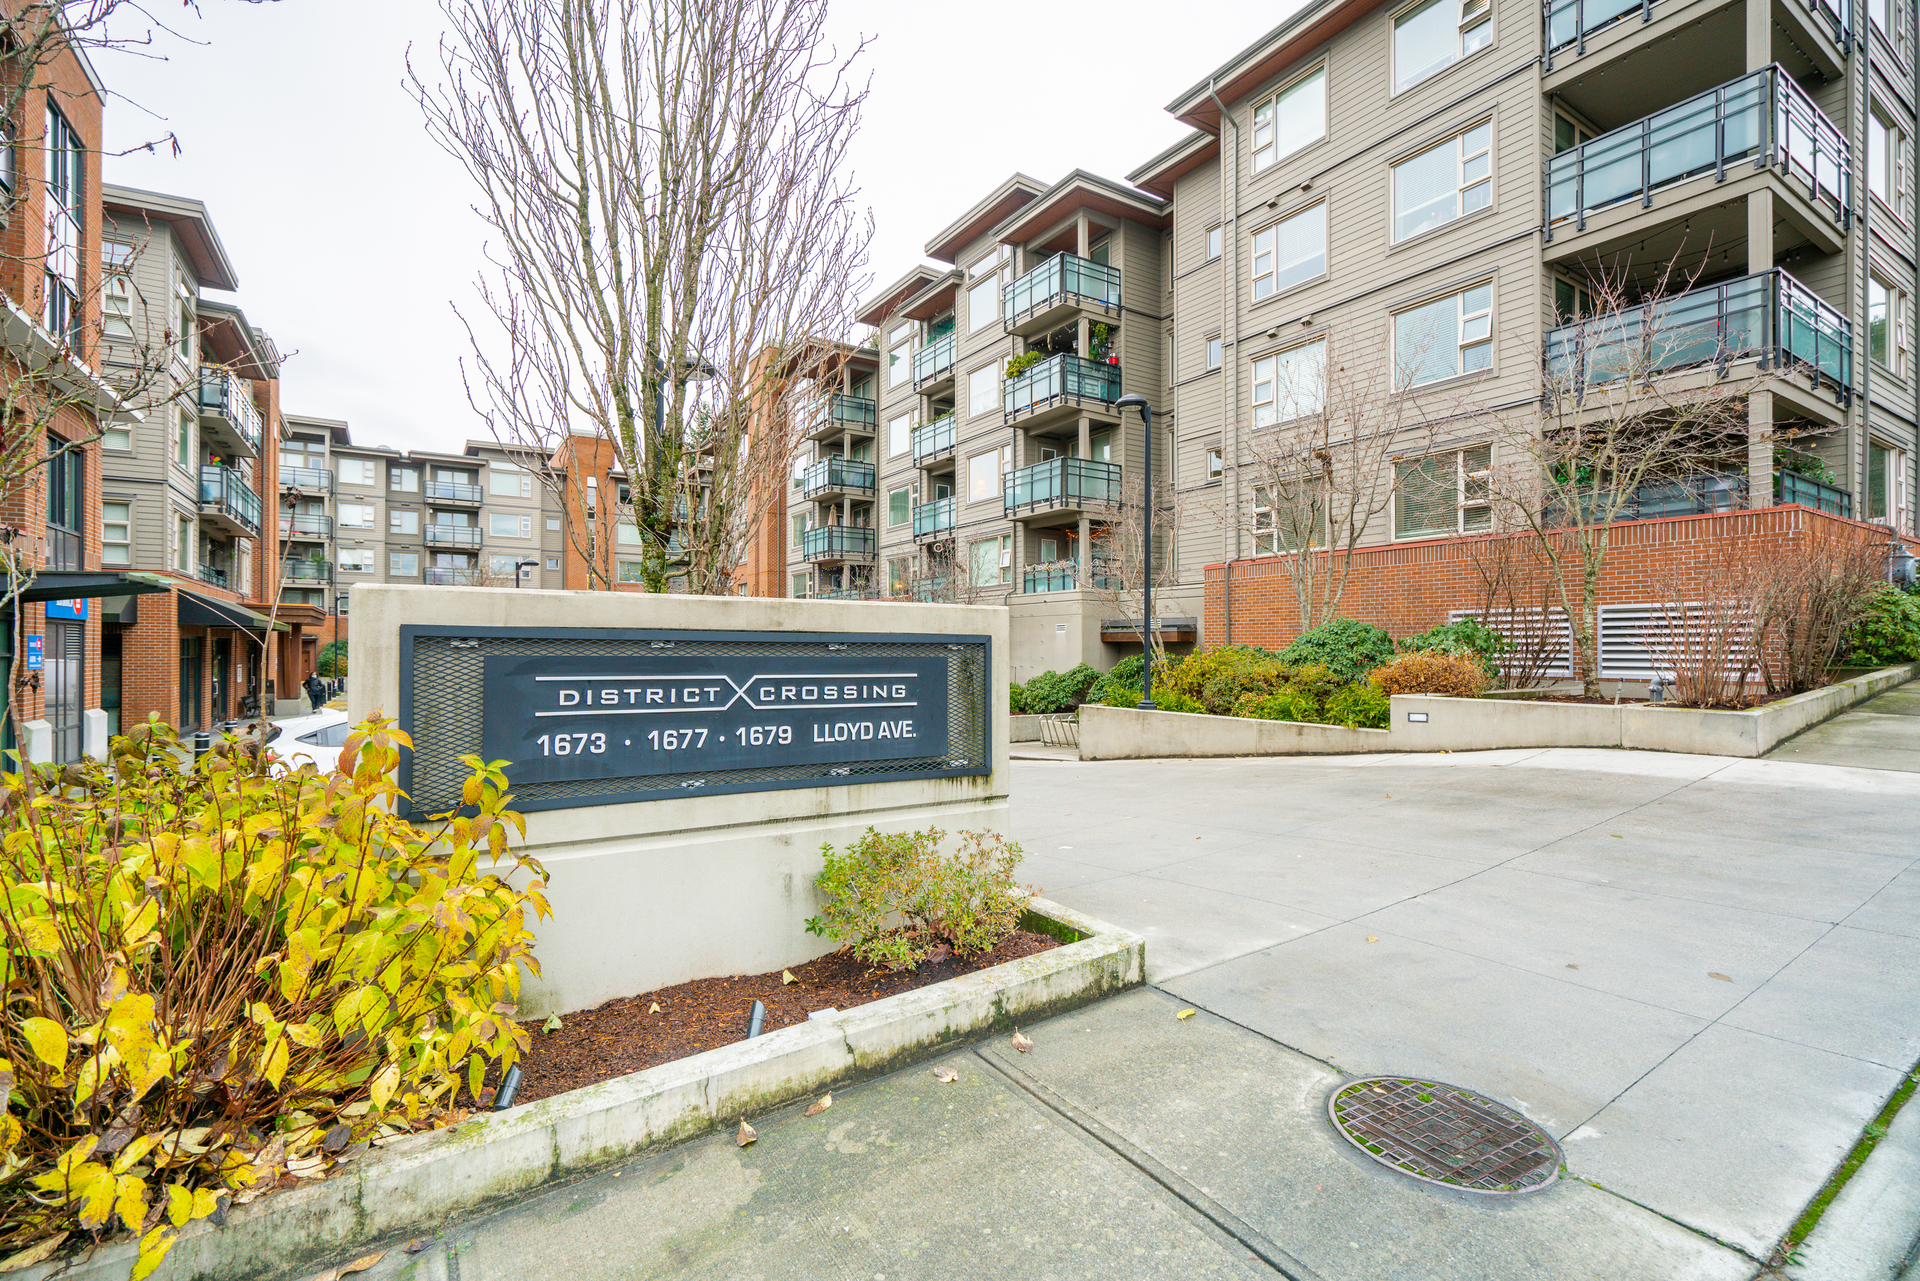 unit-410-1677-lloyd-avenue-north-vancouver-1 at 410 - 1677 Lloyd Avenue, Pemberton NV, North Vancouver